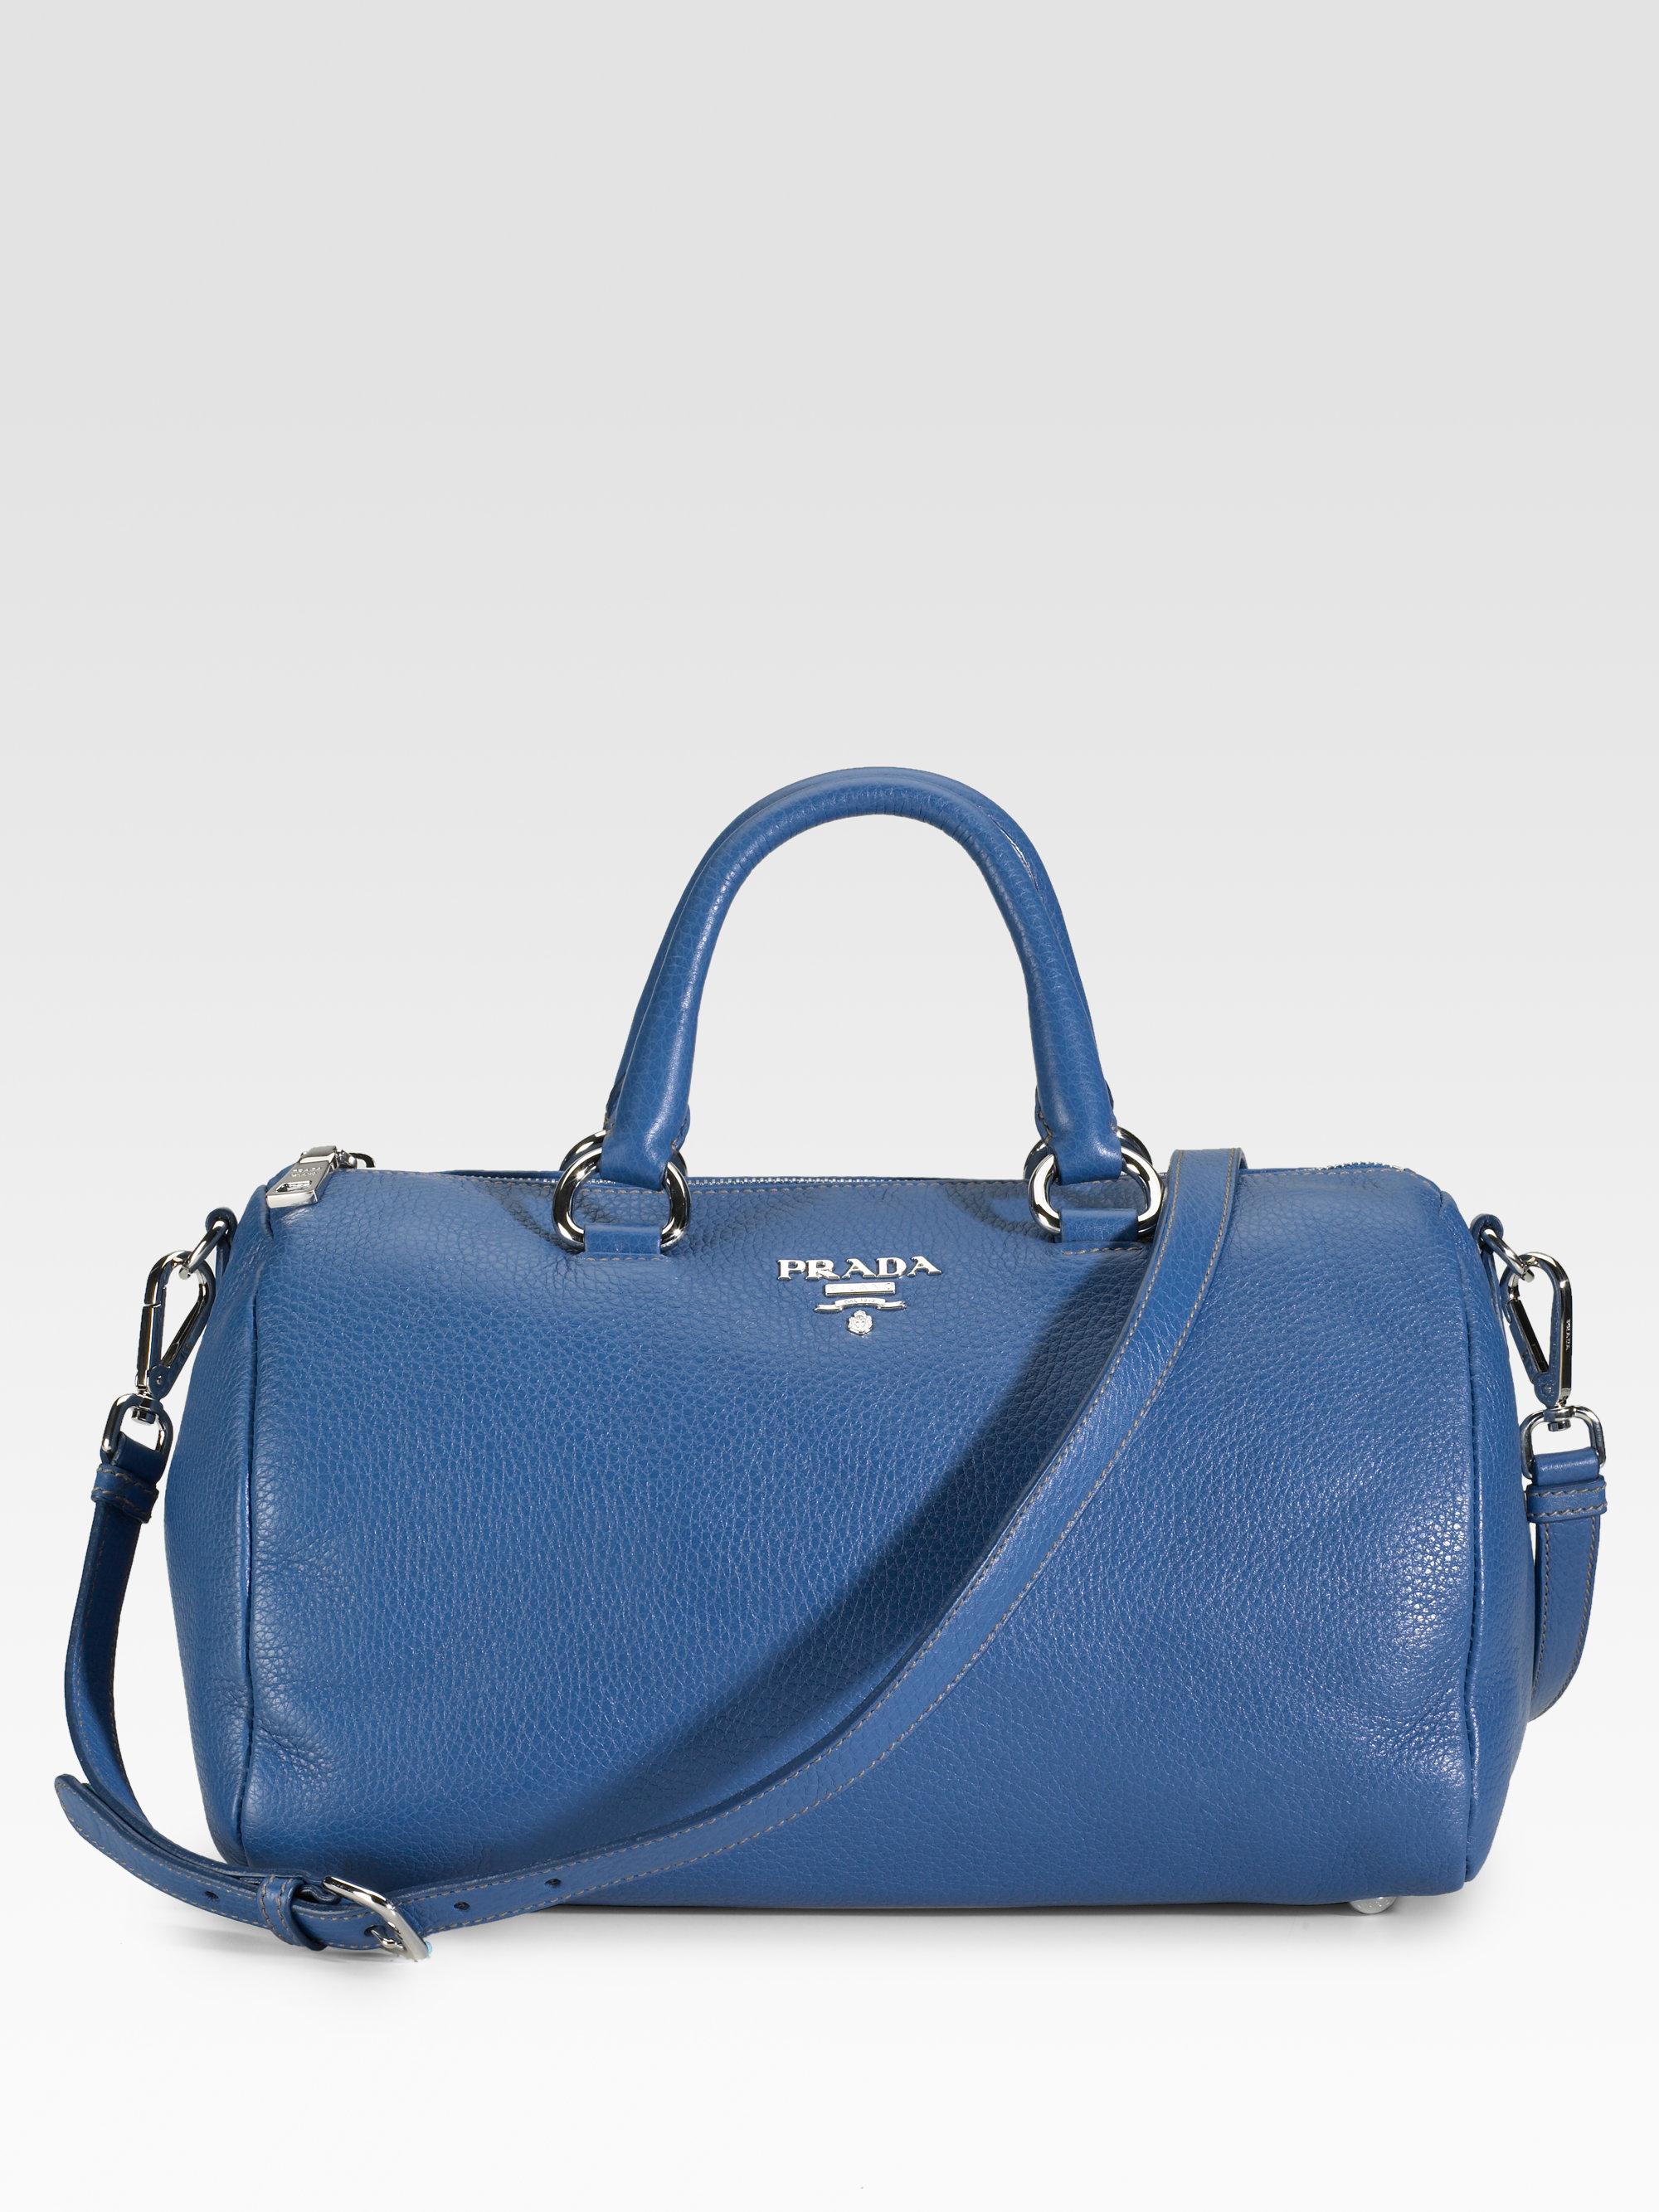 Prada Pebbled Leather Round Satchel in Blue (brown) | Lyst